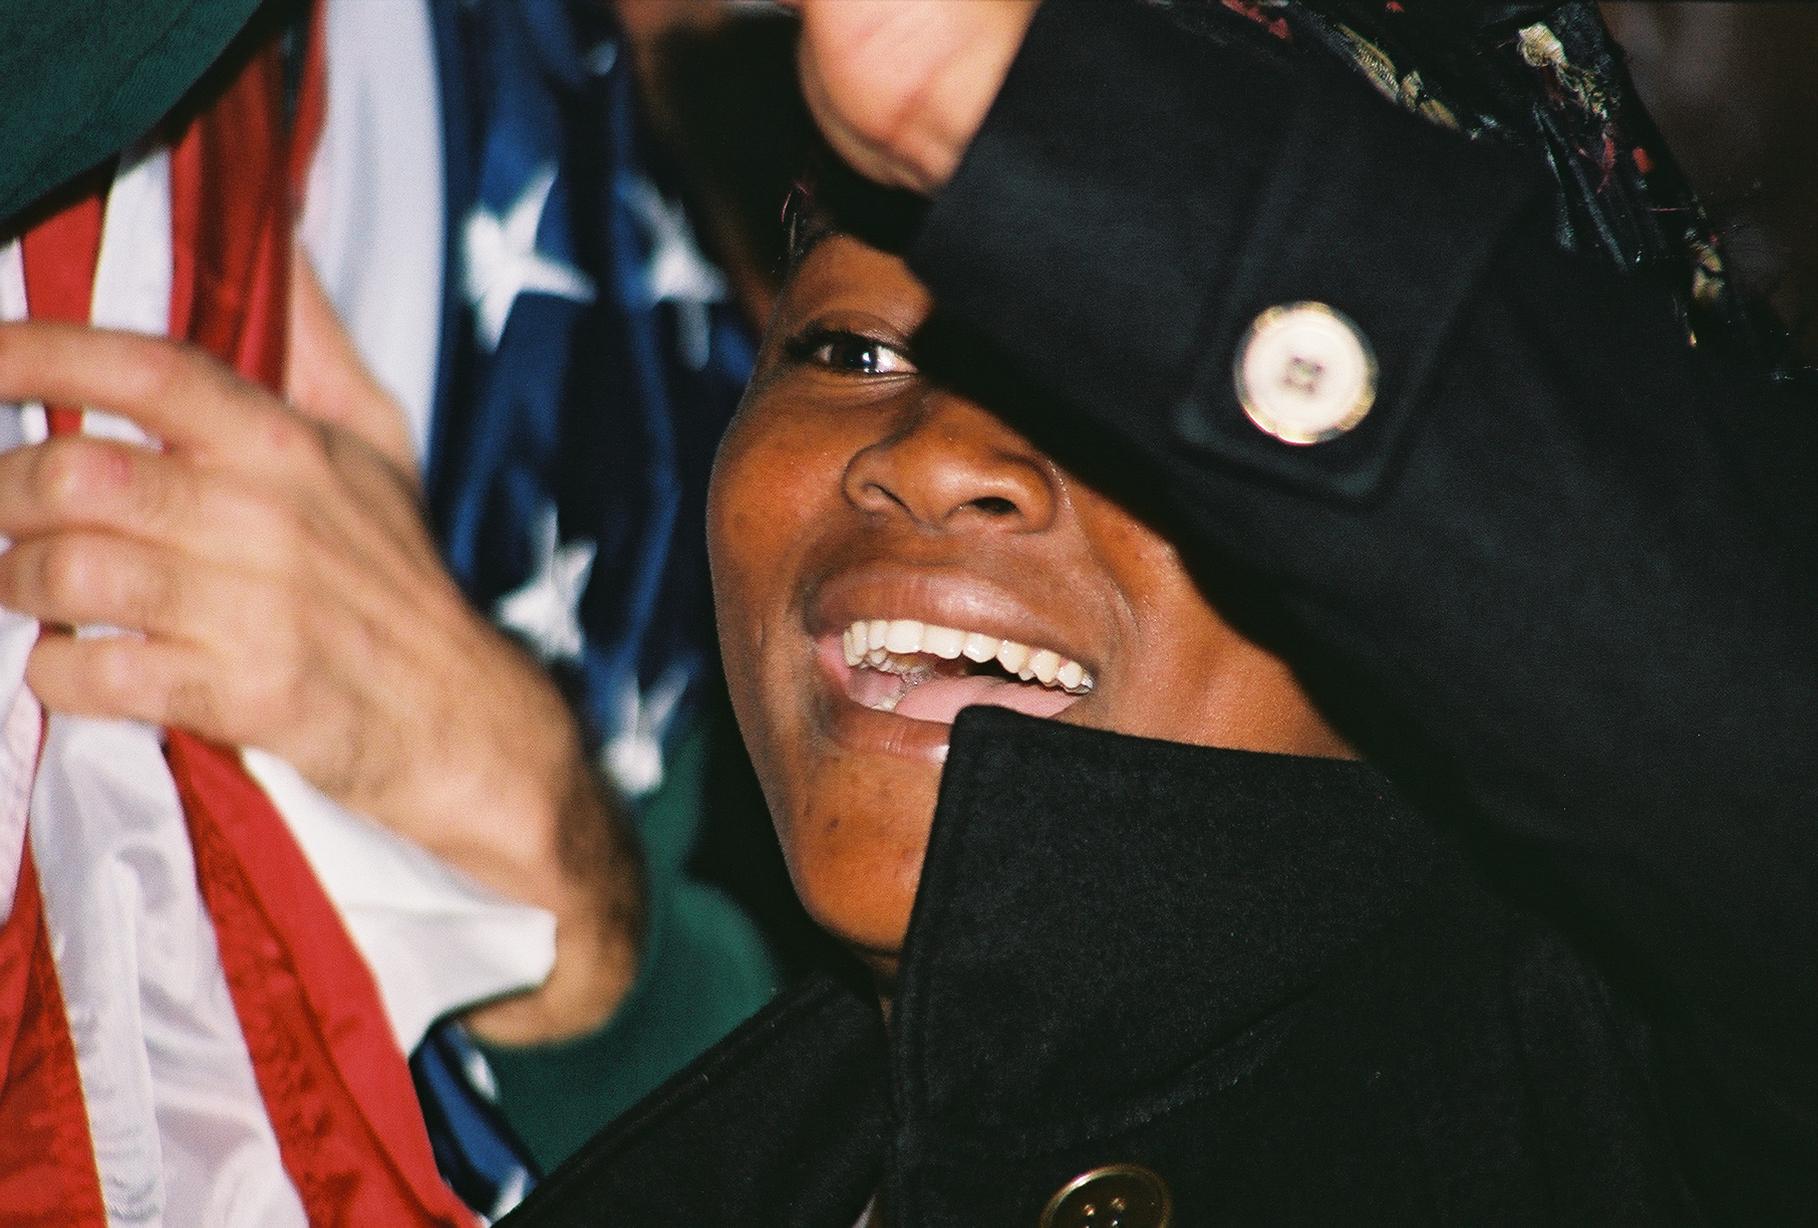 Harlem Young Girl Smiles.jpg